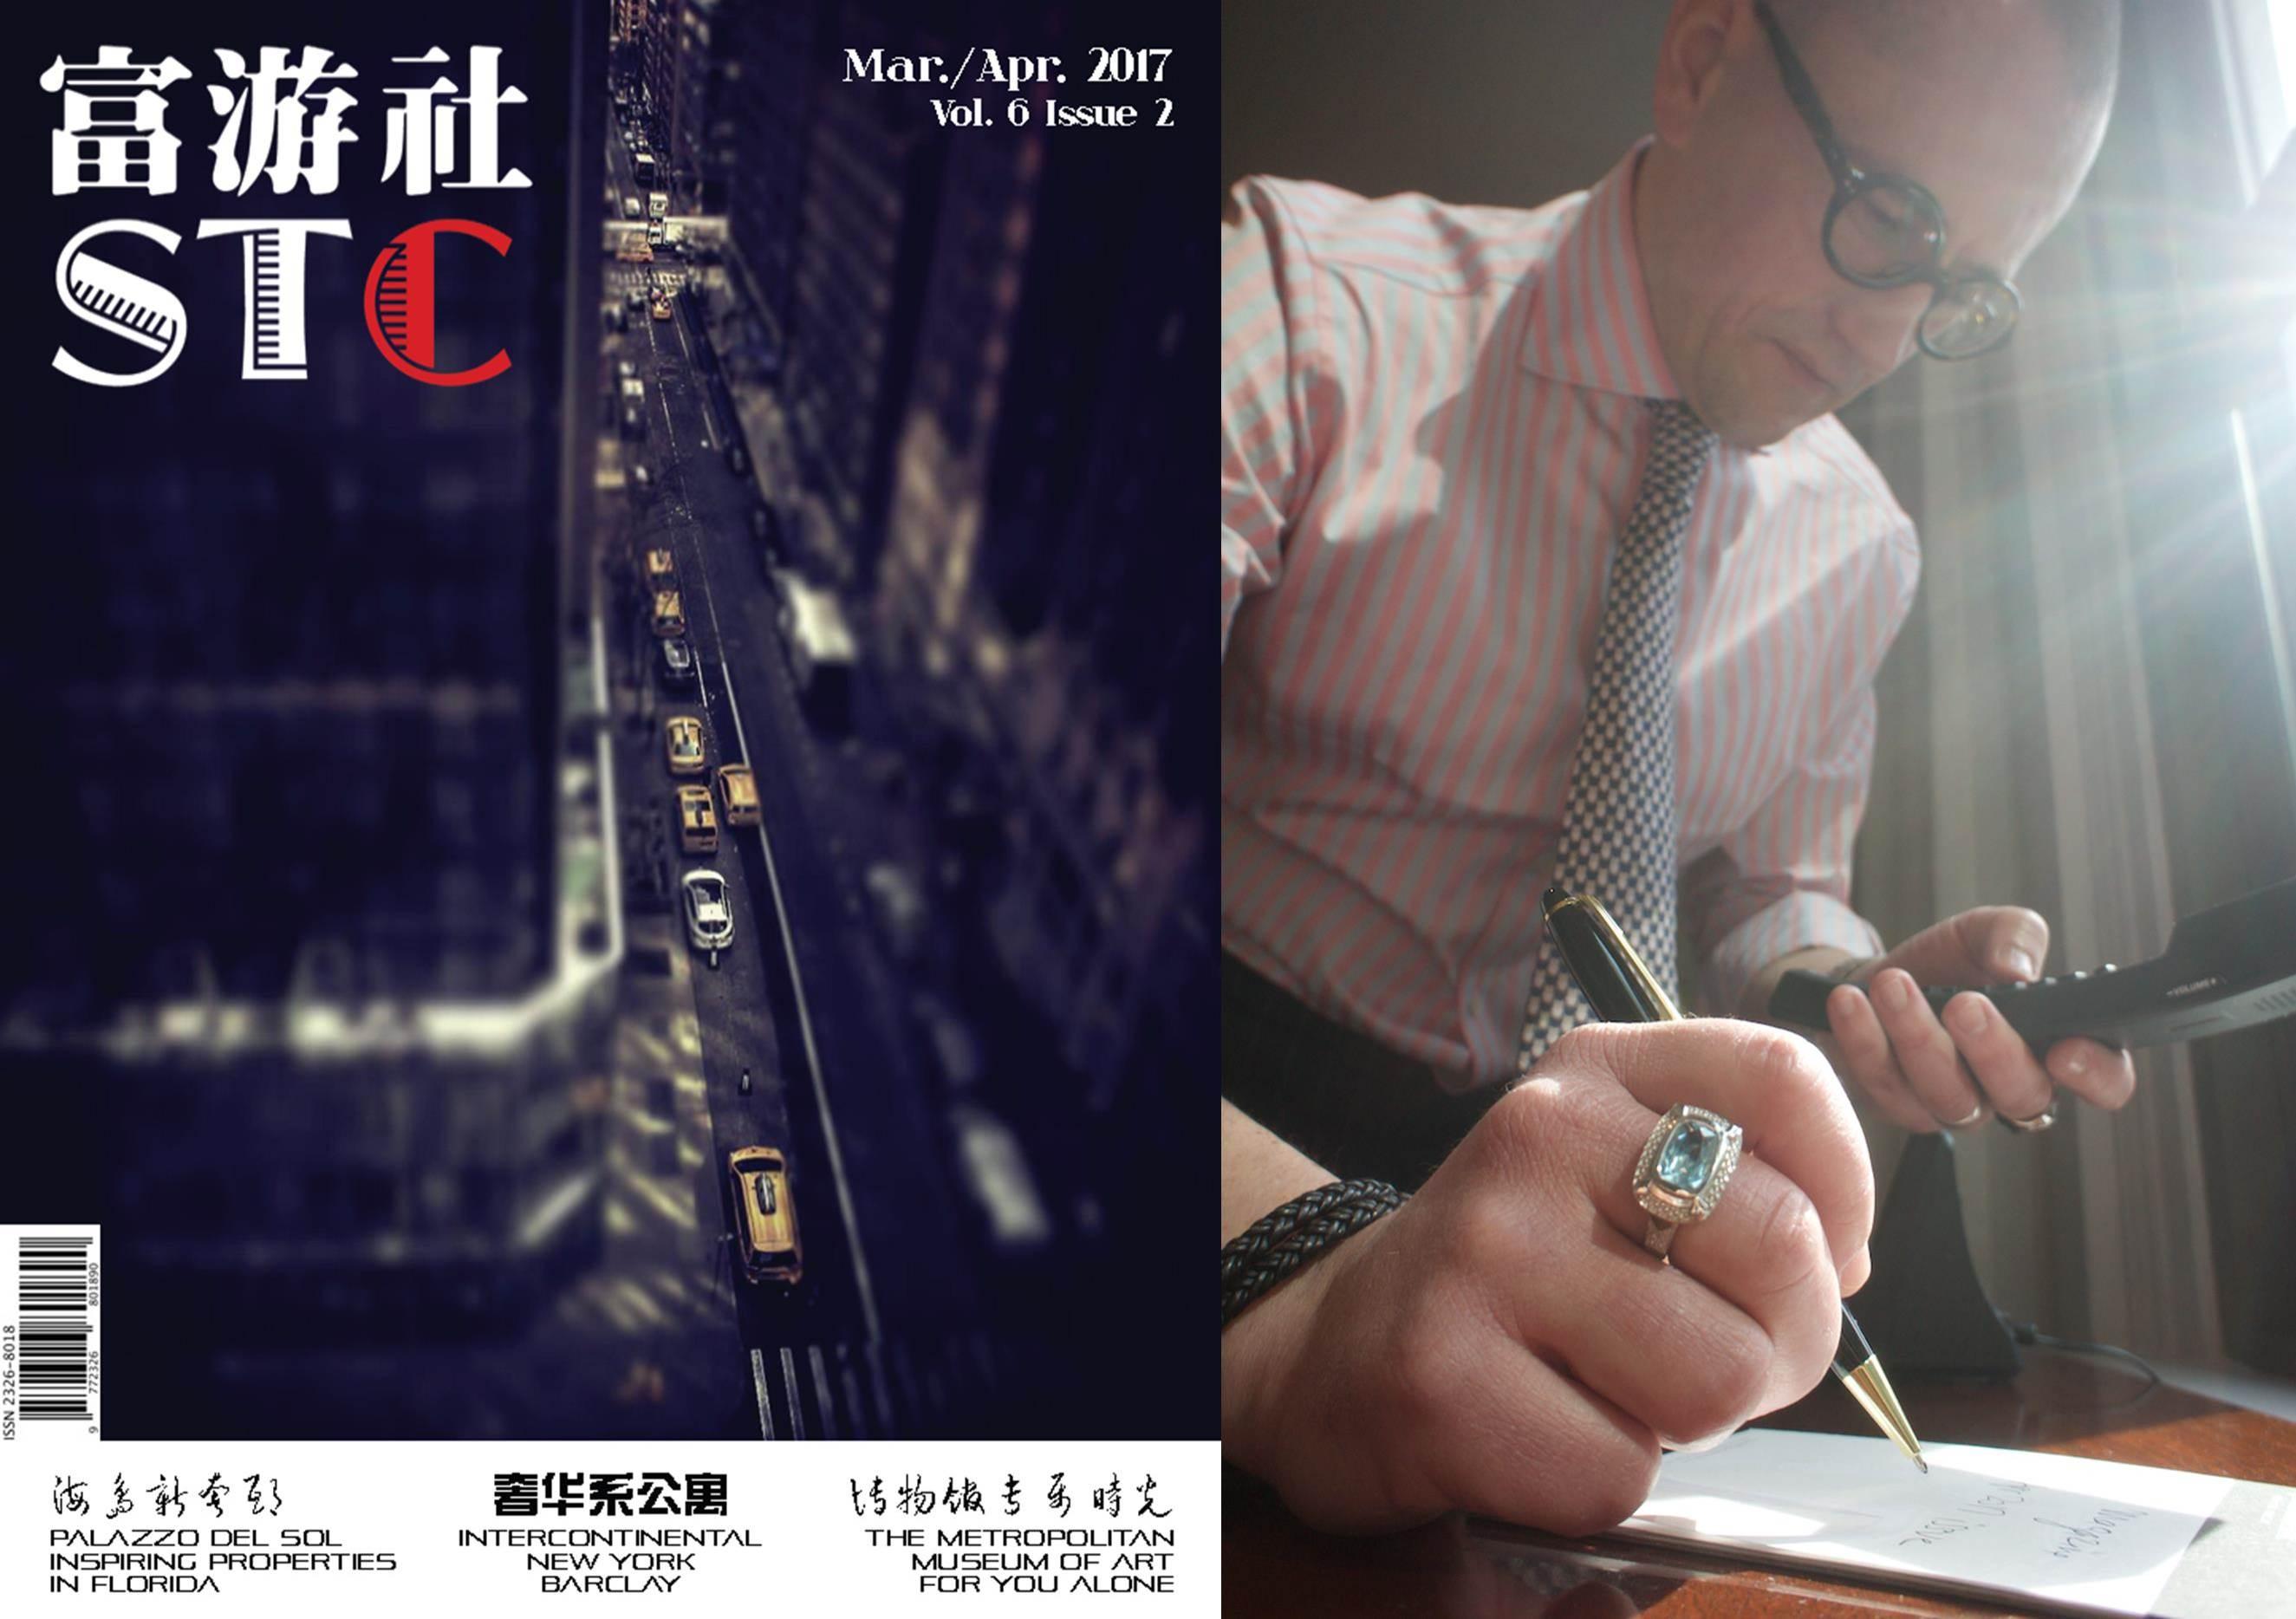 Elite & Luck Ring และ Cufflinks ในนิตยสาร STC ฉบับเดือนมีนาคม/เมษายน 2017.